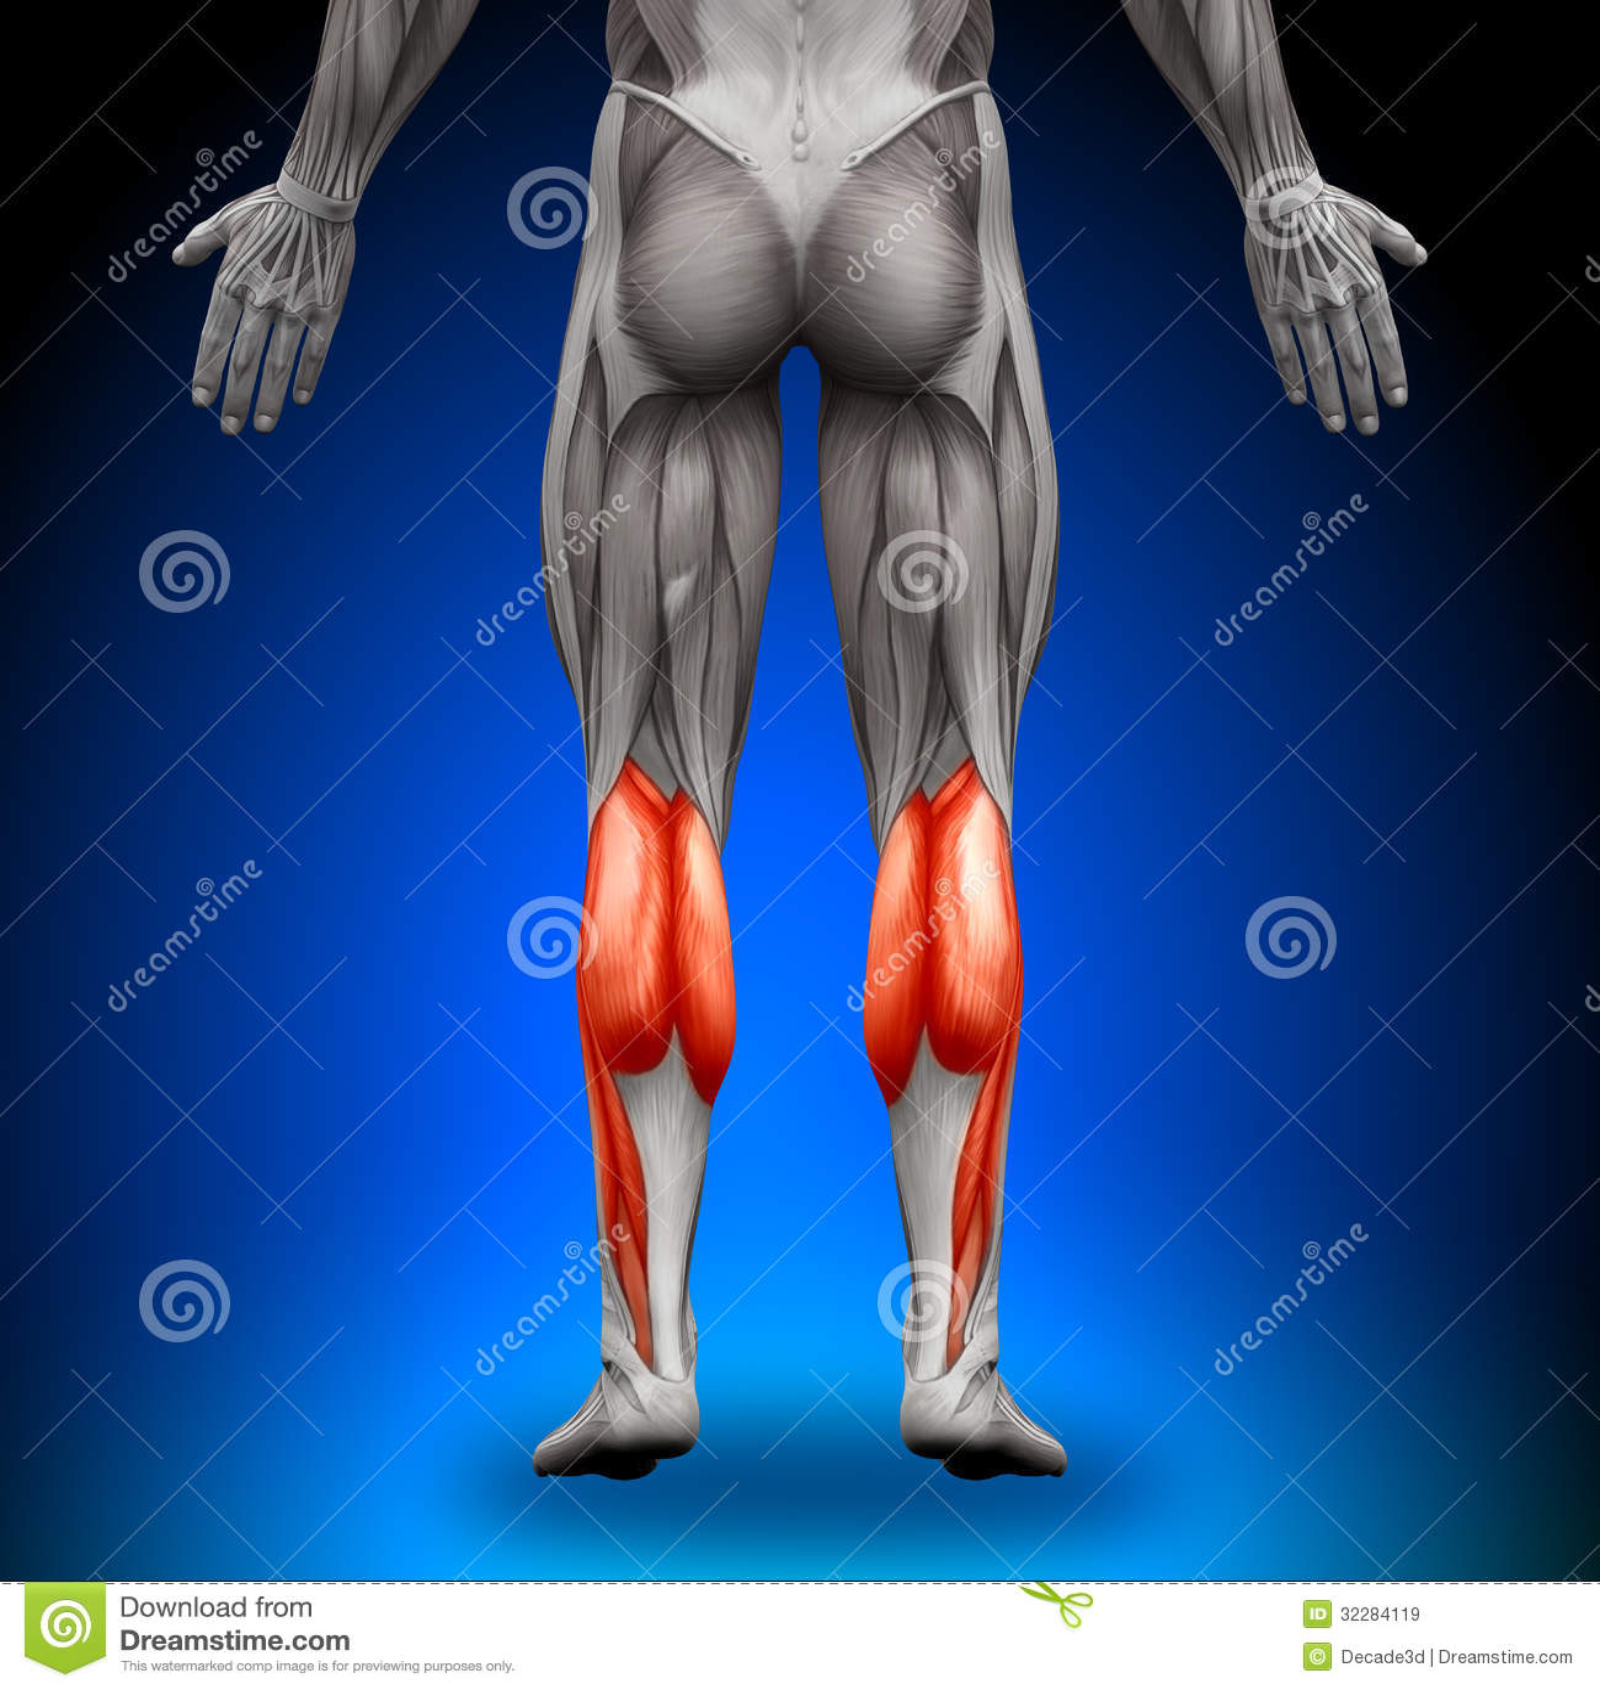 Kälber - Anatomie-Muskeln stock abbildung. Illustration von unterarm ...